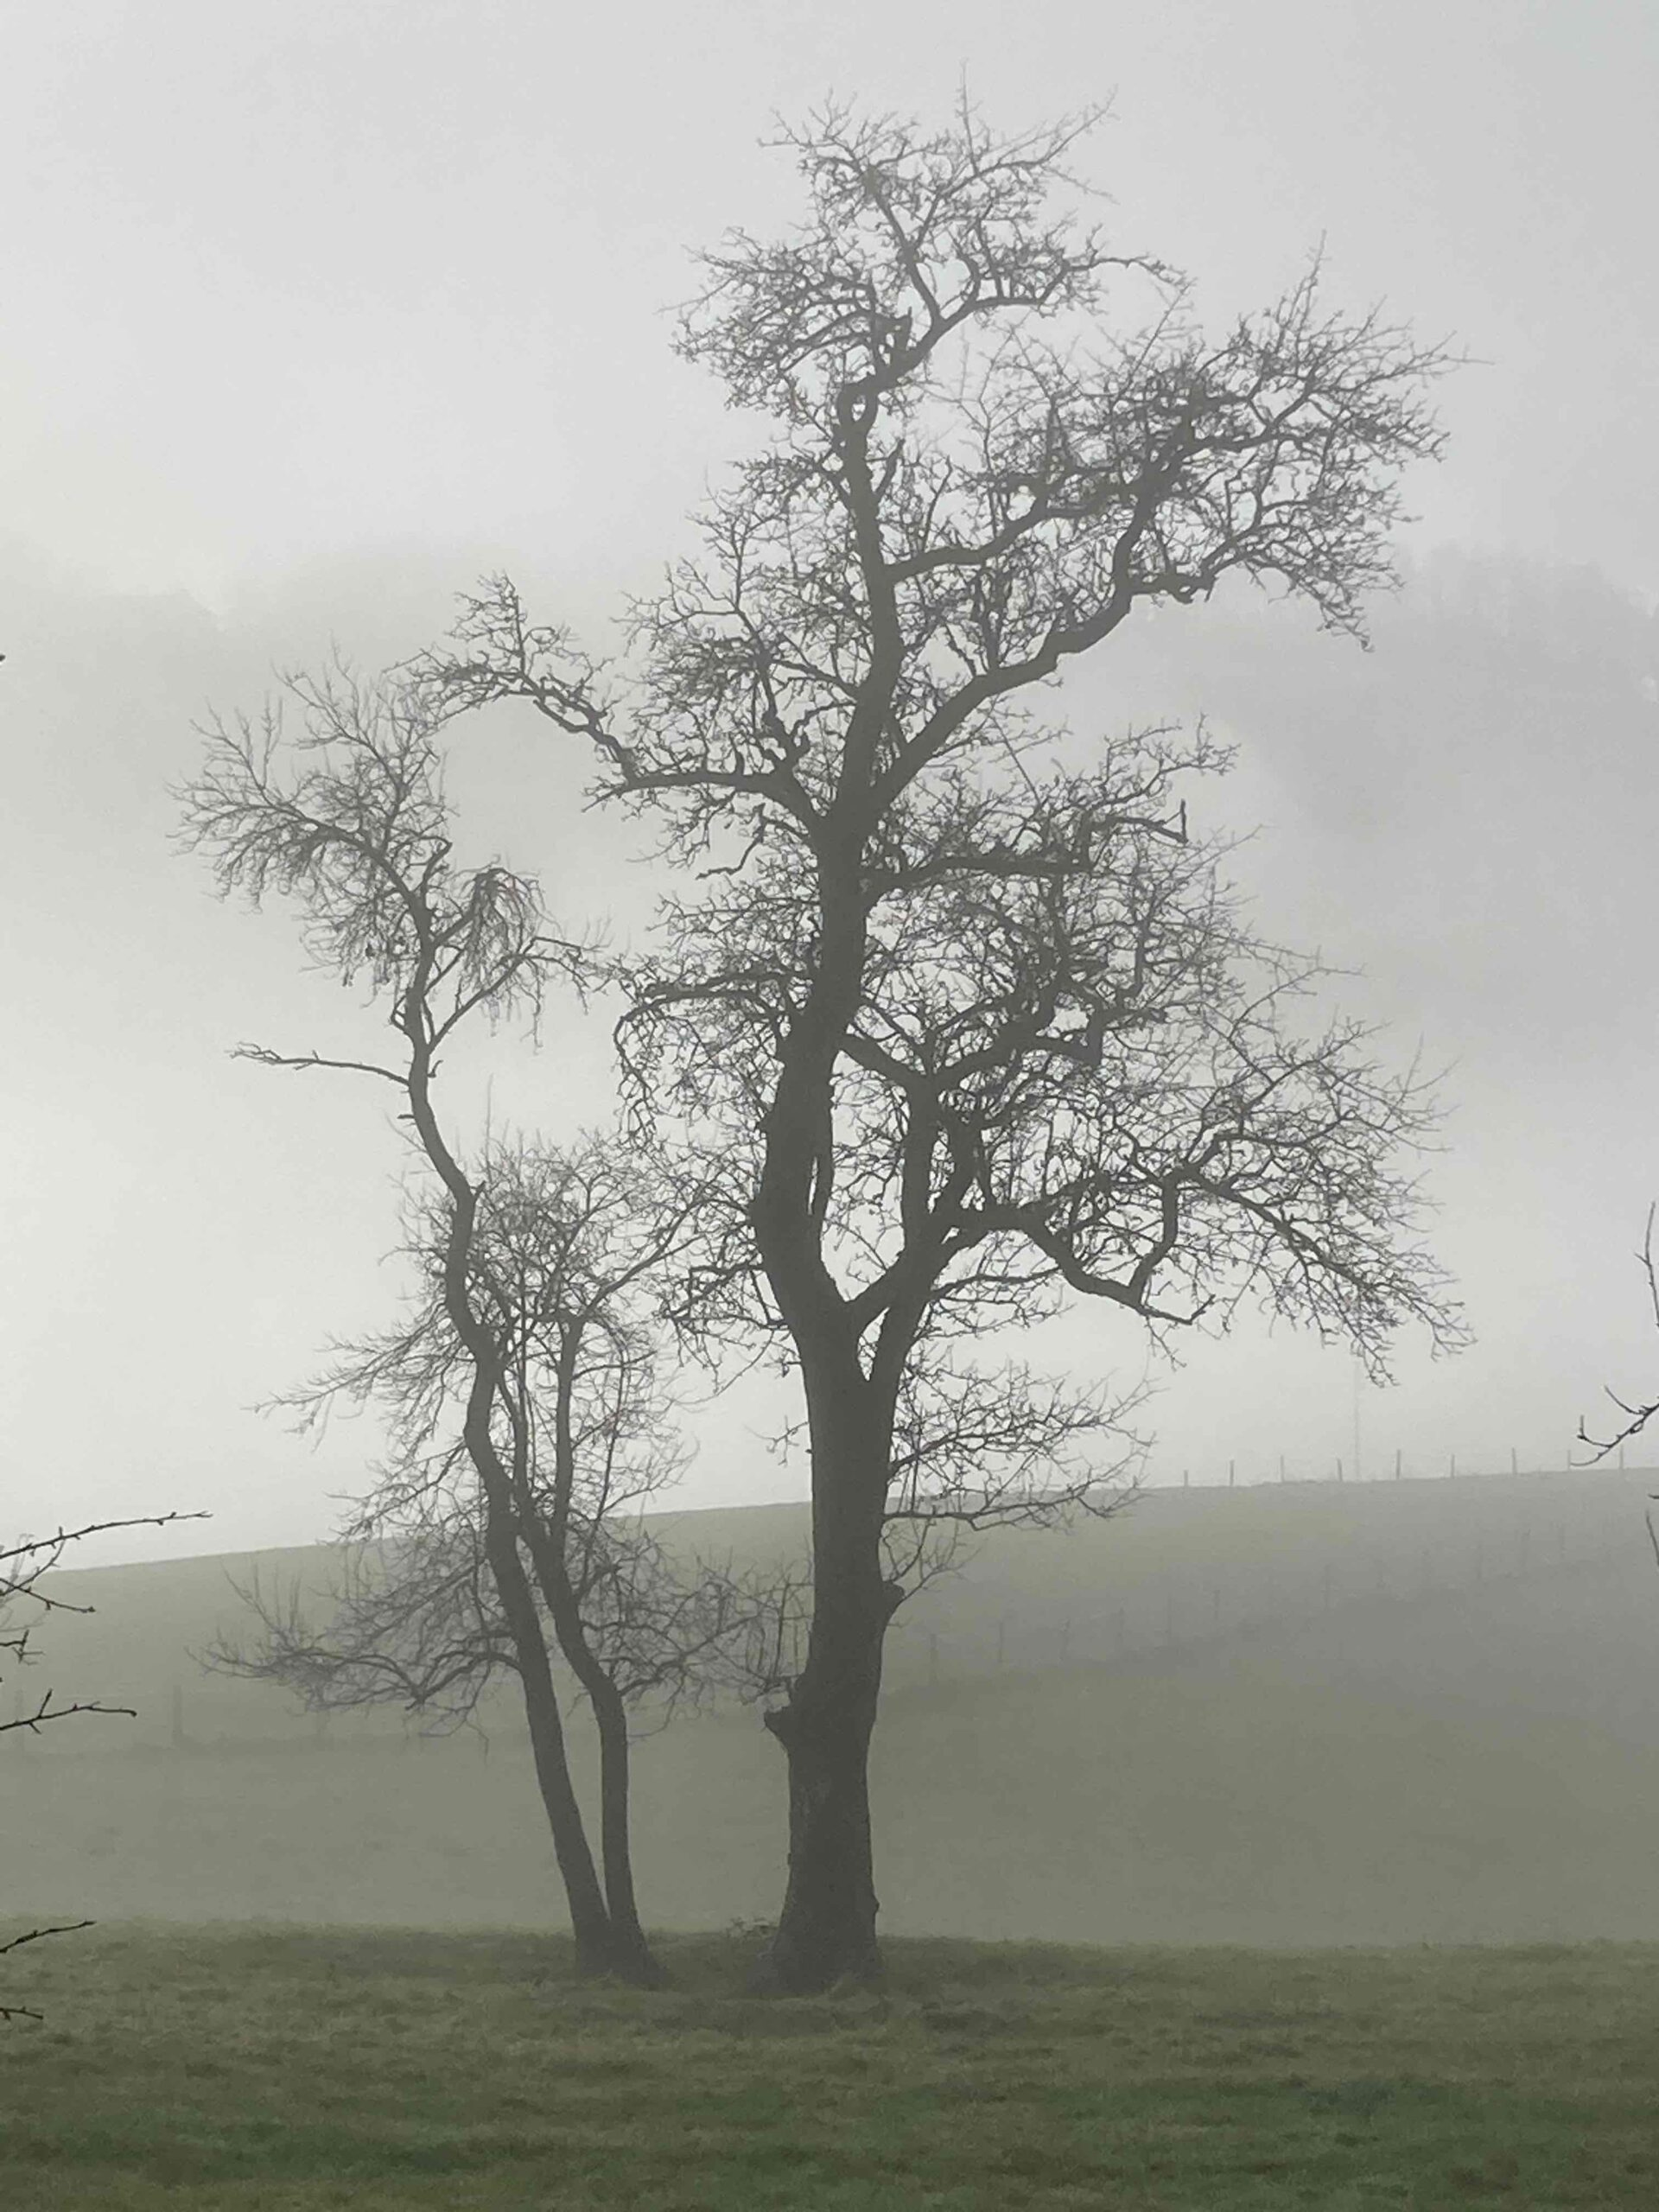 Bäume im Nebel (2), Fotografie, 2020